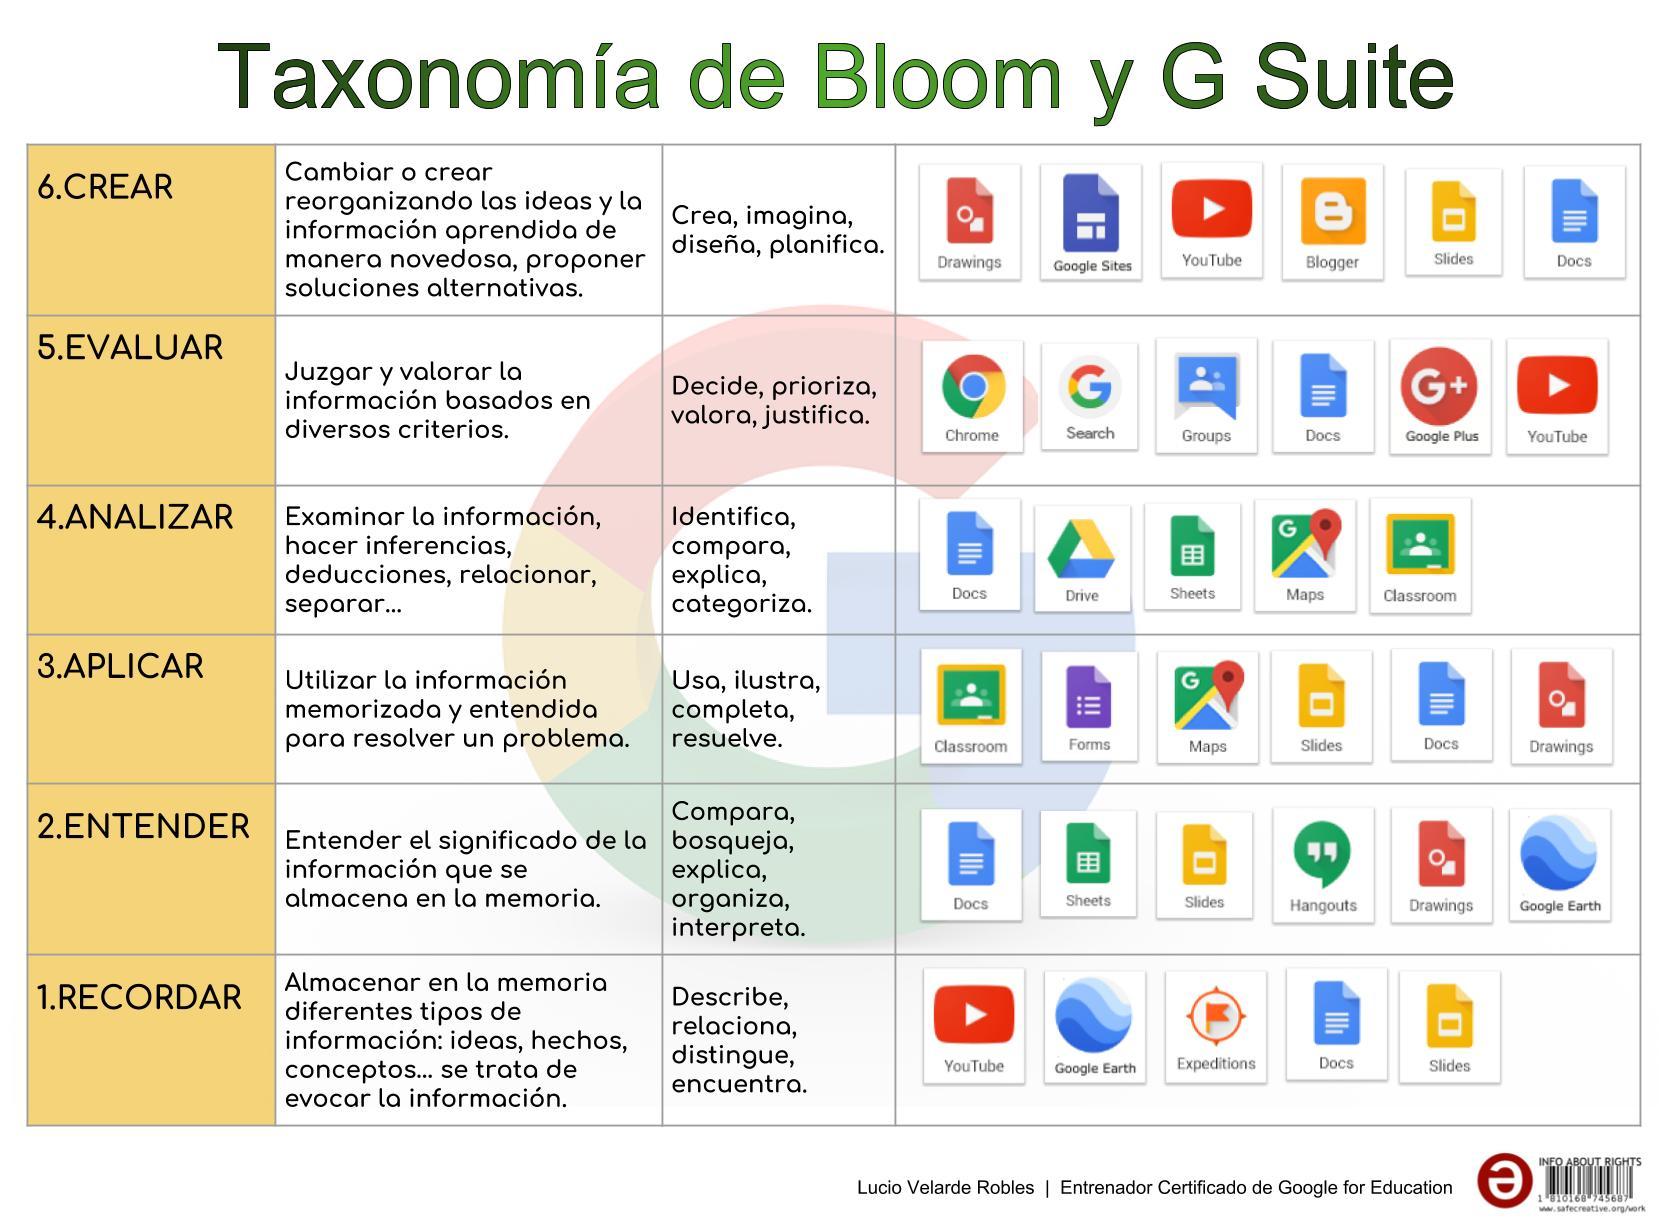 TAXONOMIA DE BLOOM Y G SUITE